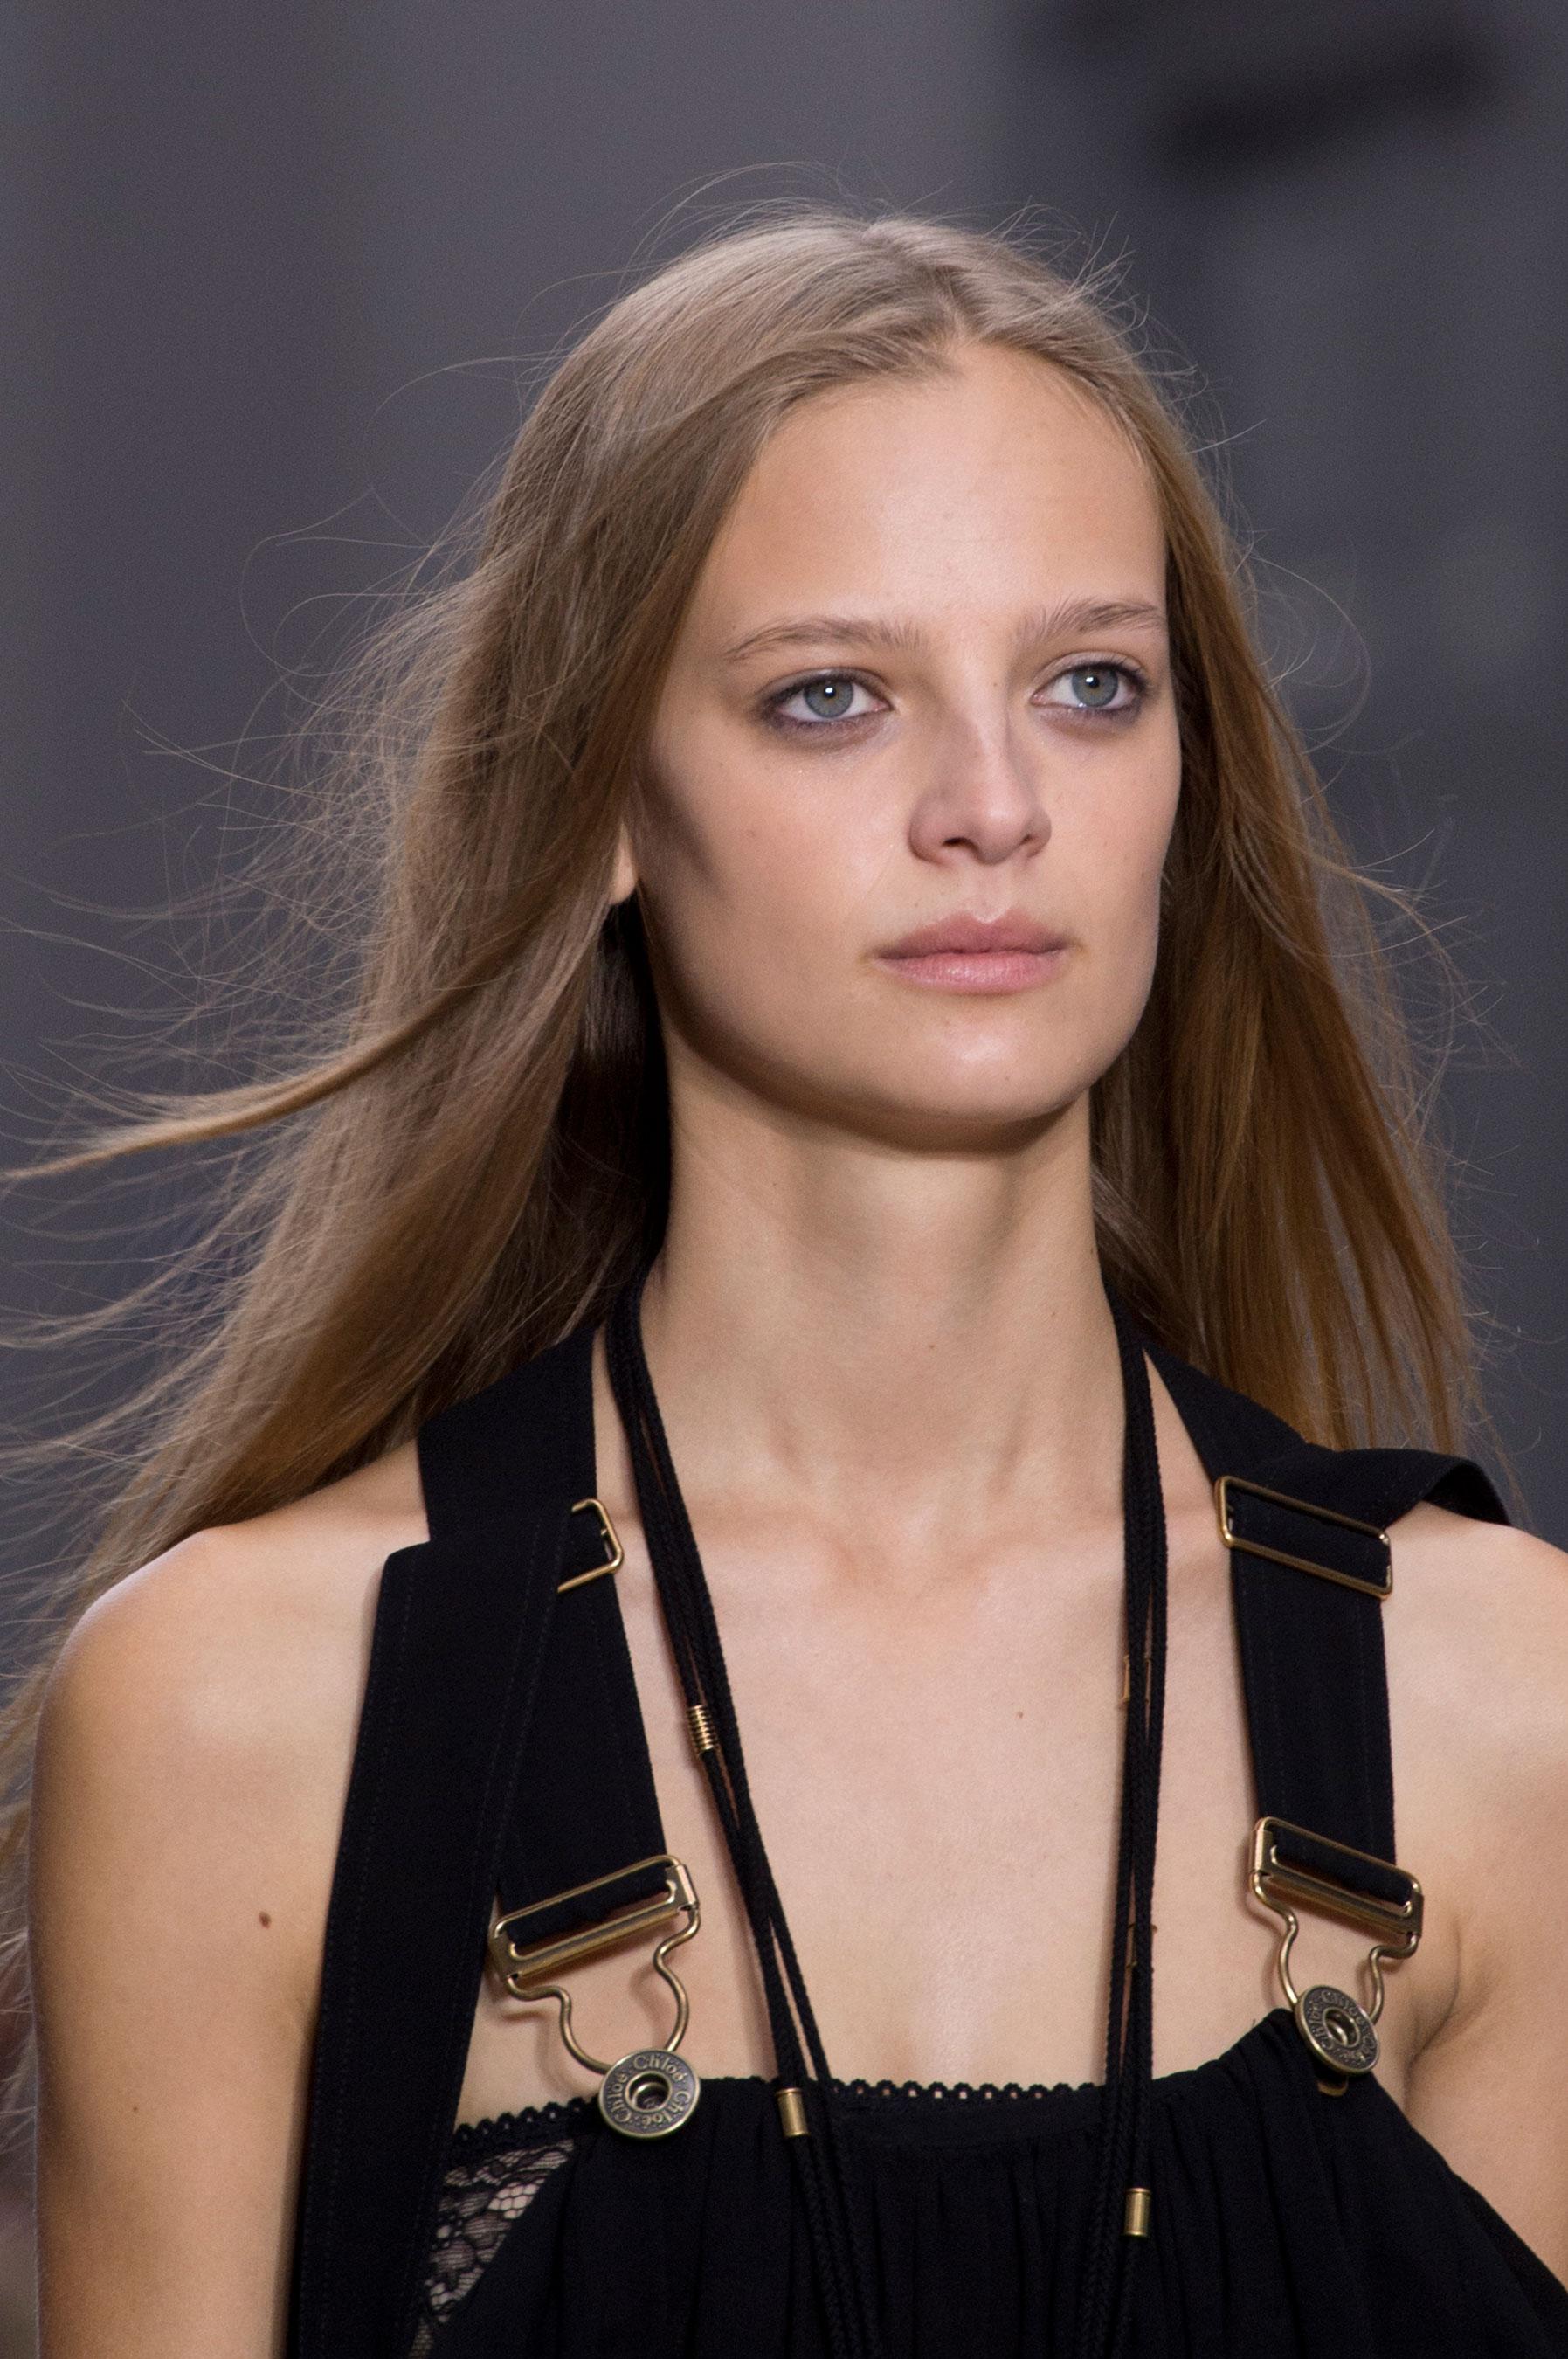 Chloe-spring-2016-runway-beauty-fashion-show-the-impression-23